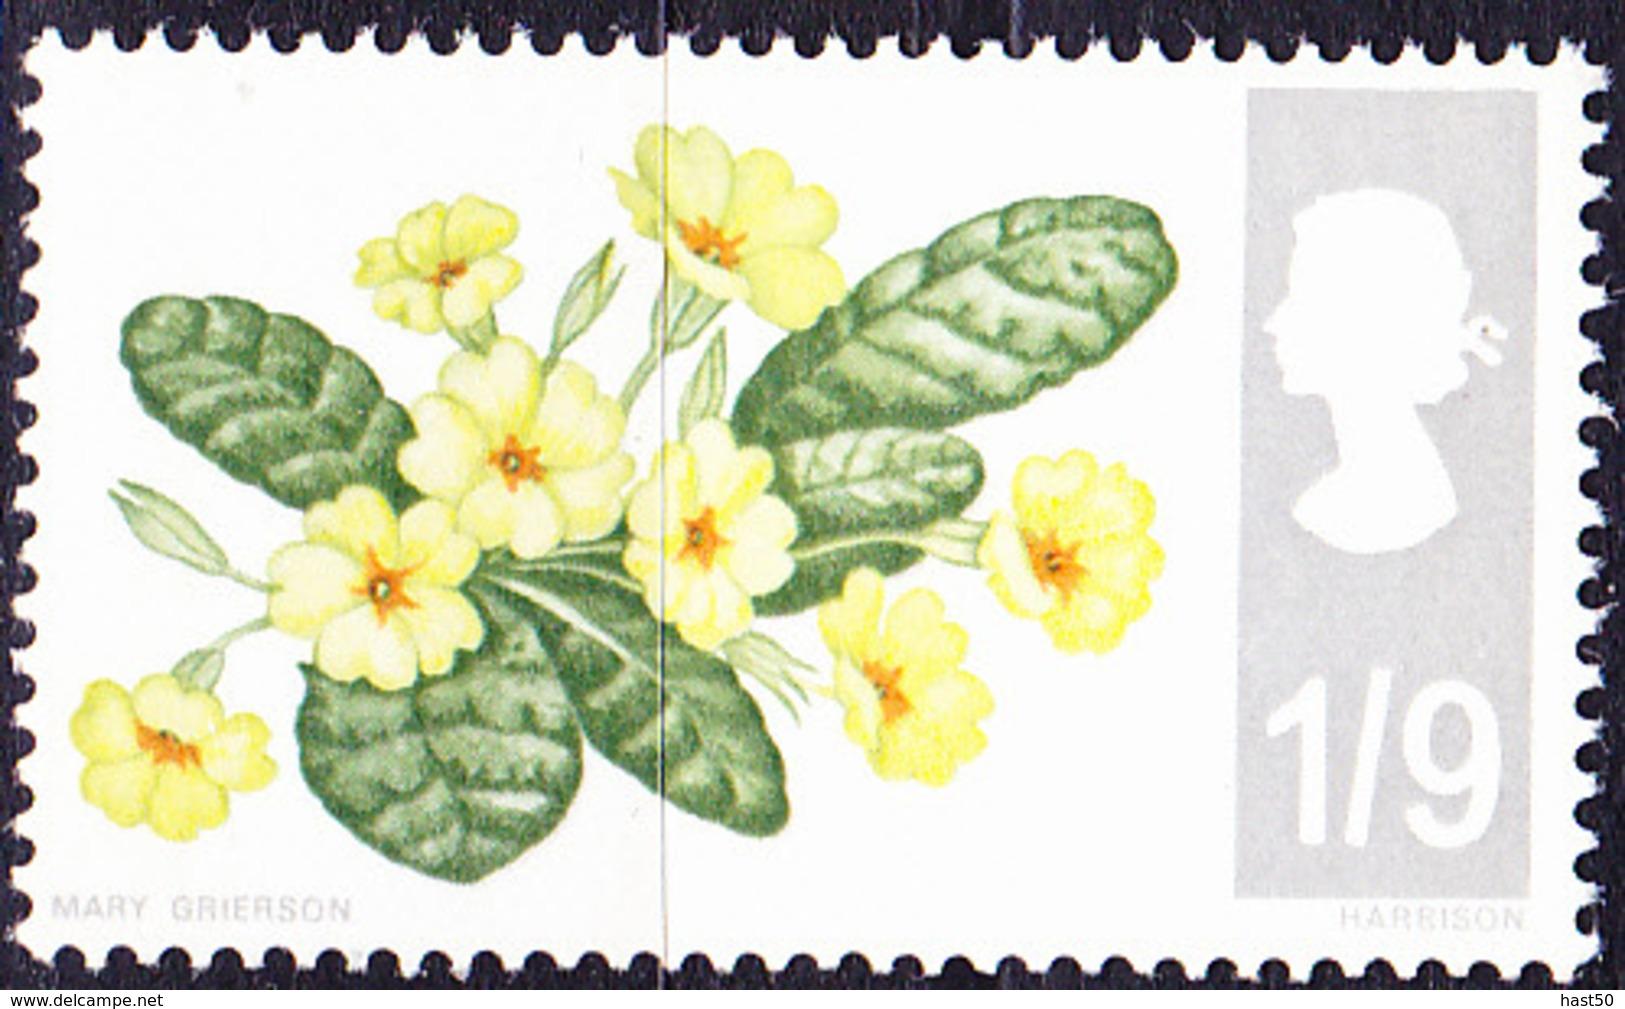 Großbritannien Great Britain Grande-Bretagne - Kissenprimel (Primula Vulgaris) (MiNr: 451 Y) 1967 - Postfrisch MNH - Unused Stamps